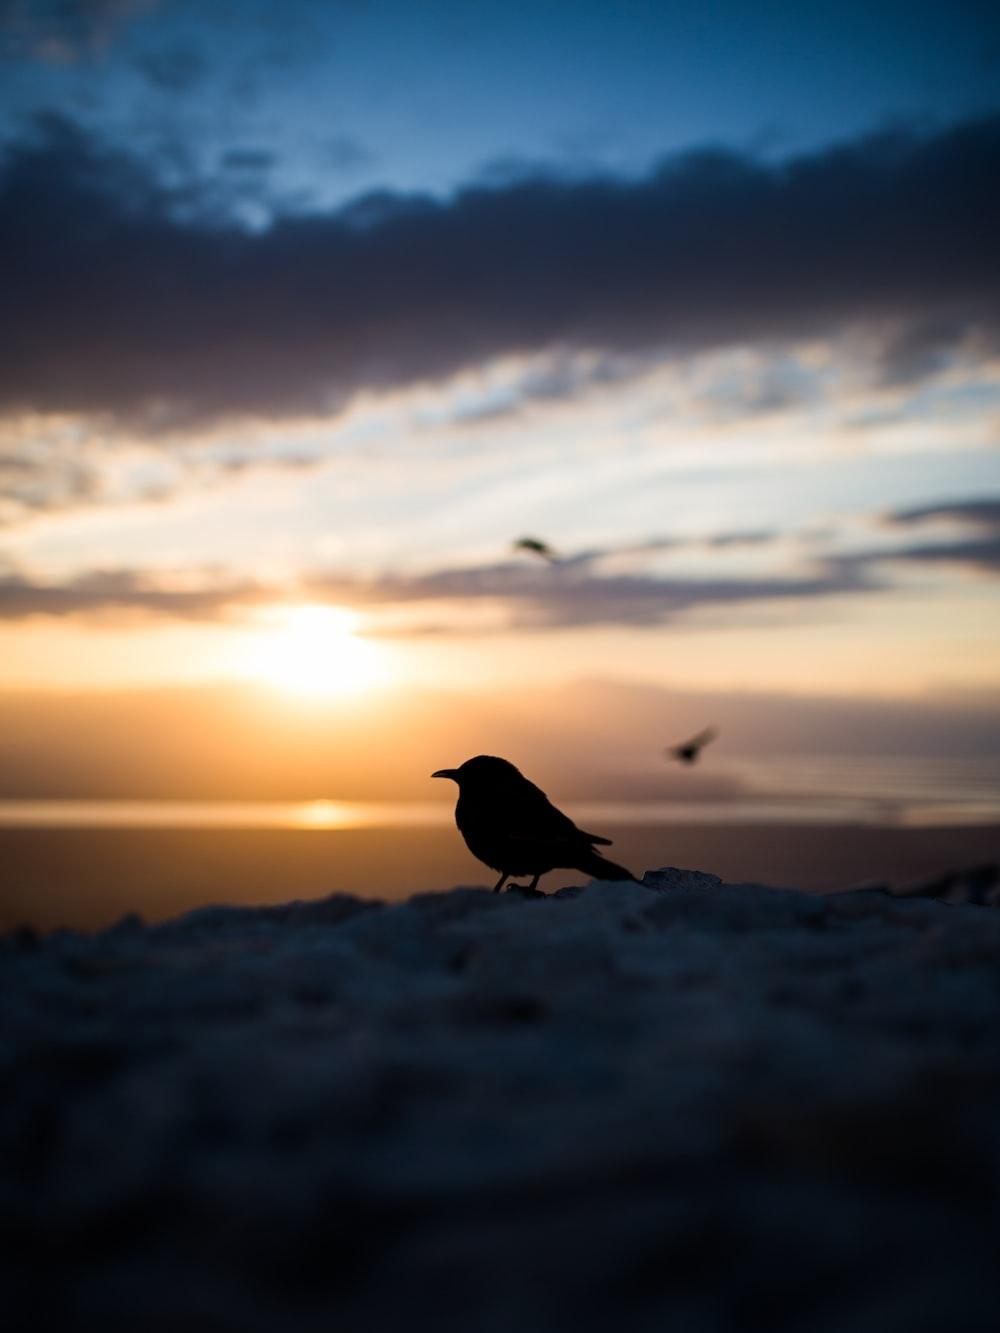 silhouette of bird during golden hour